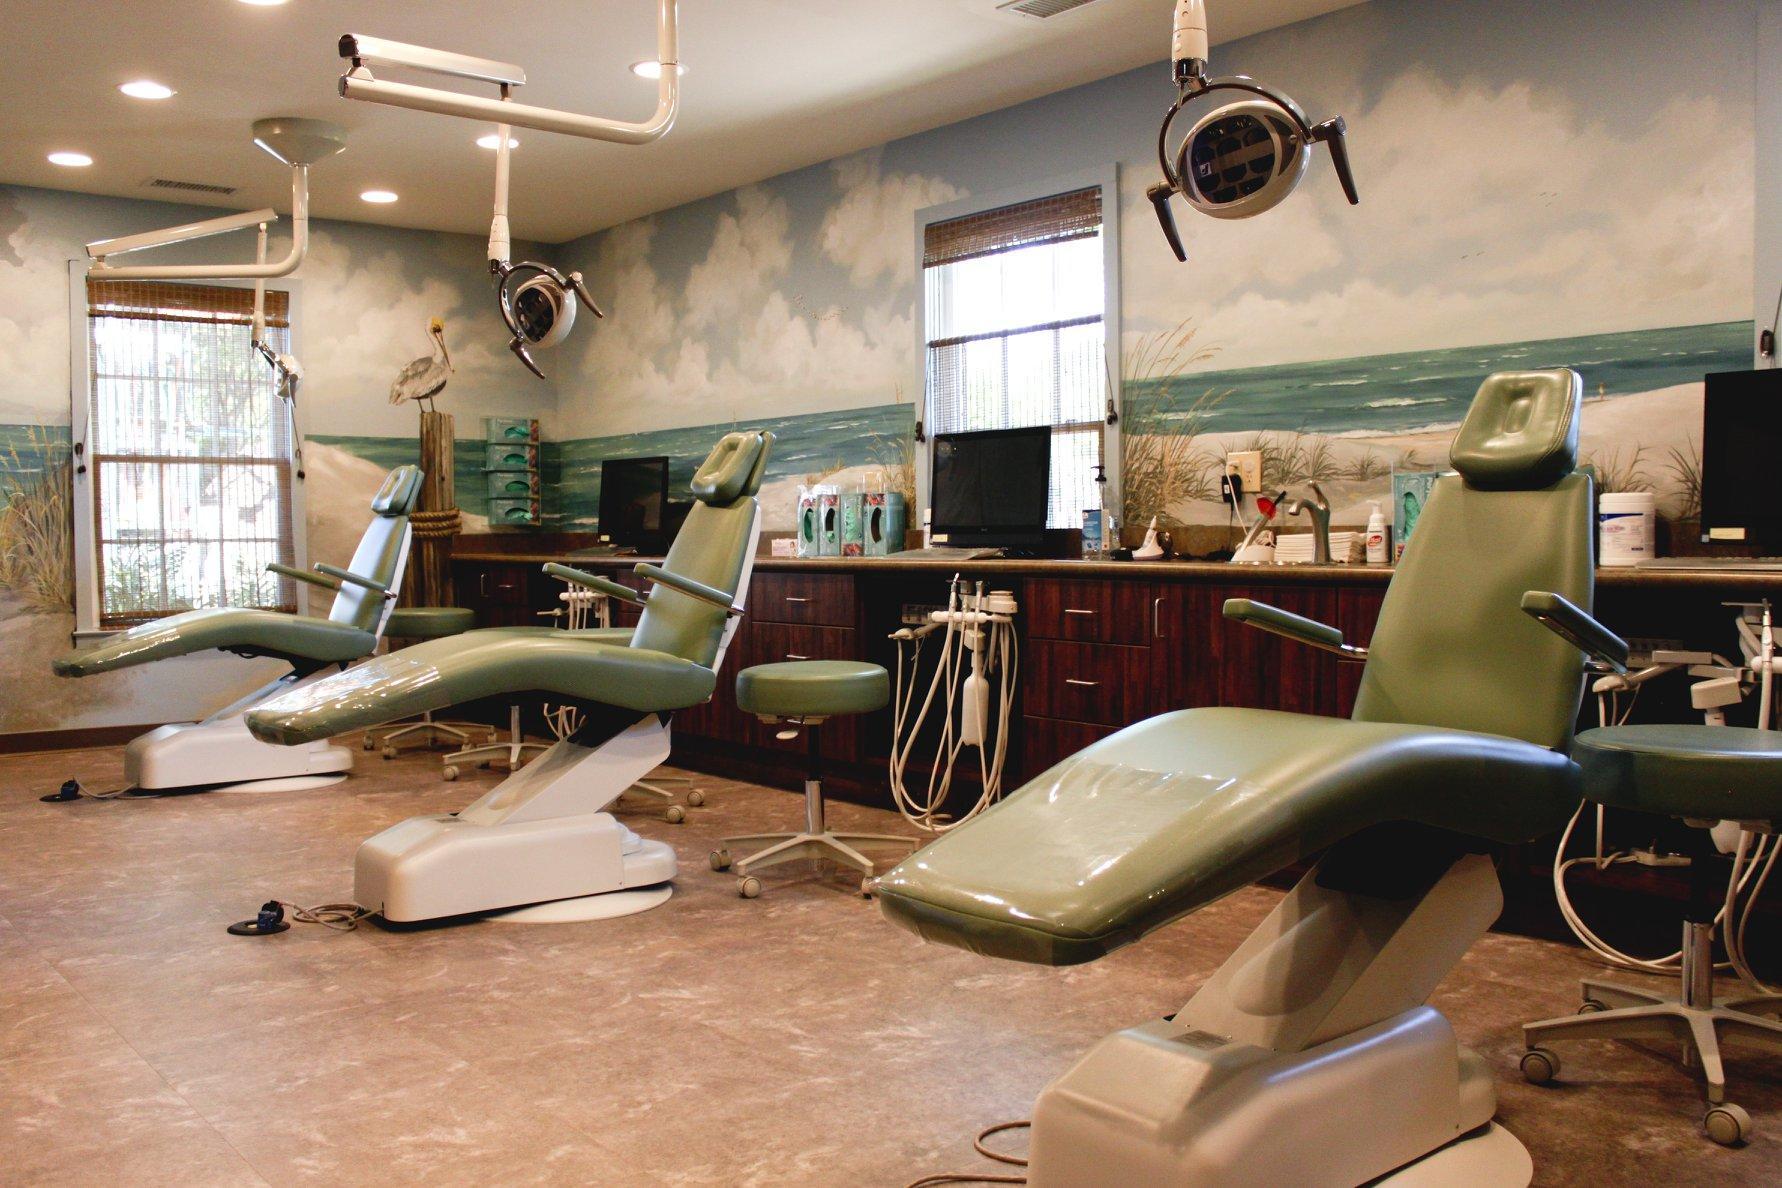 Brink & White Pediatric Dental Associate image 3